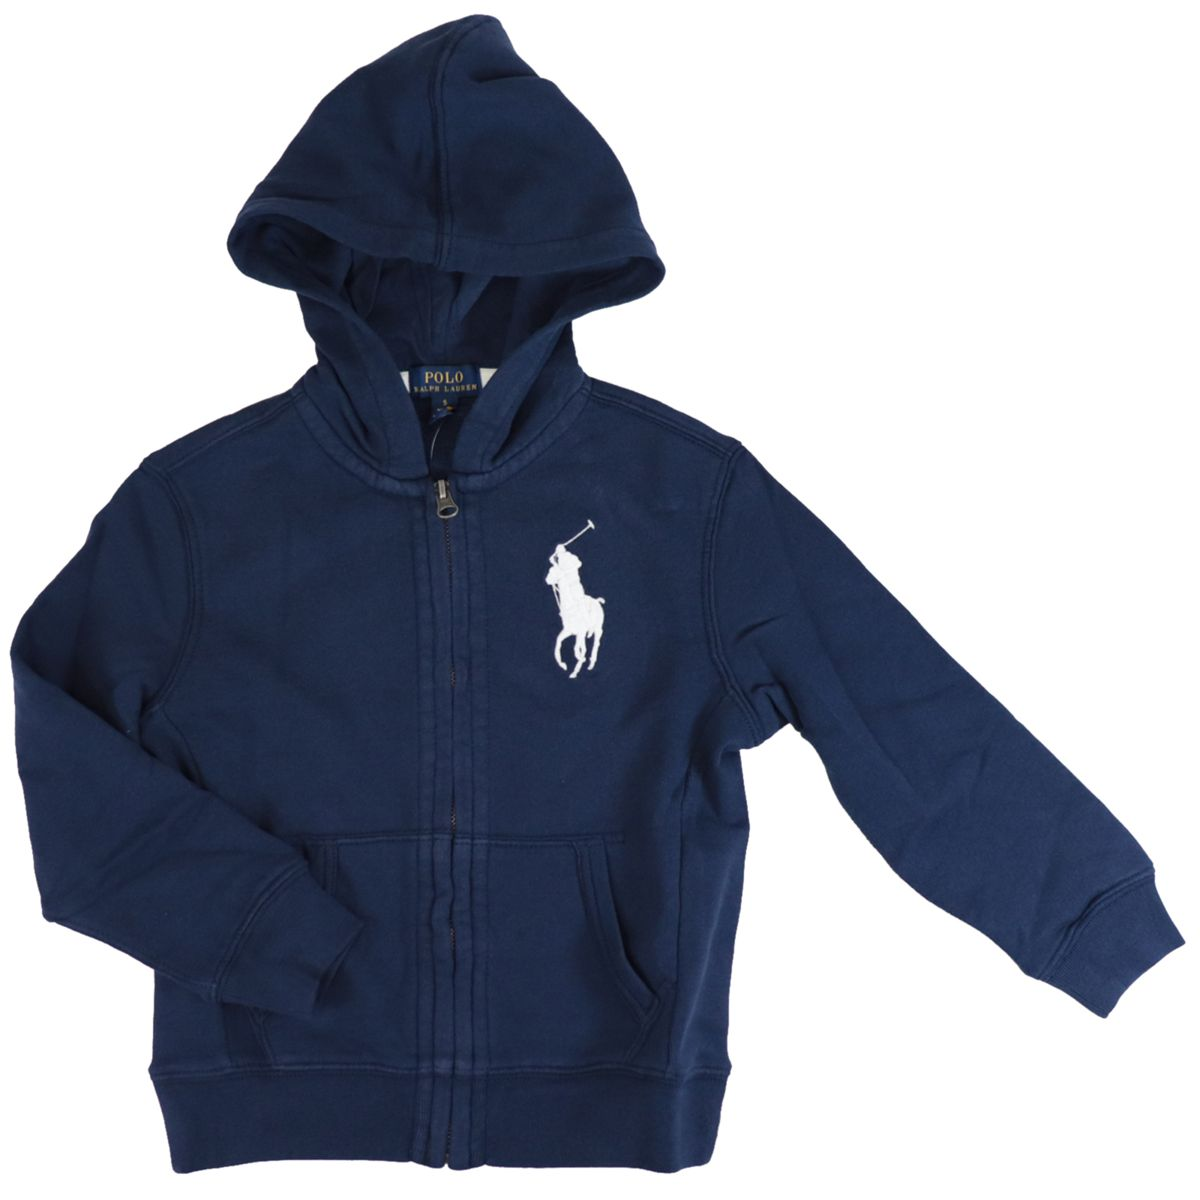 Cotton sweatshirt with maxi logo and hood Navy Polo Ralph Lauren